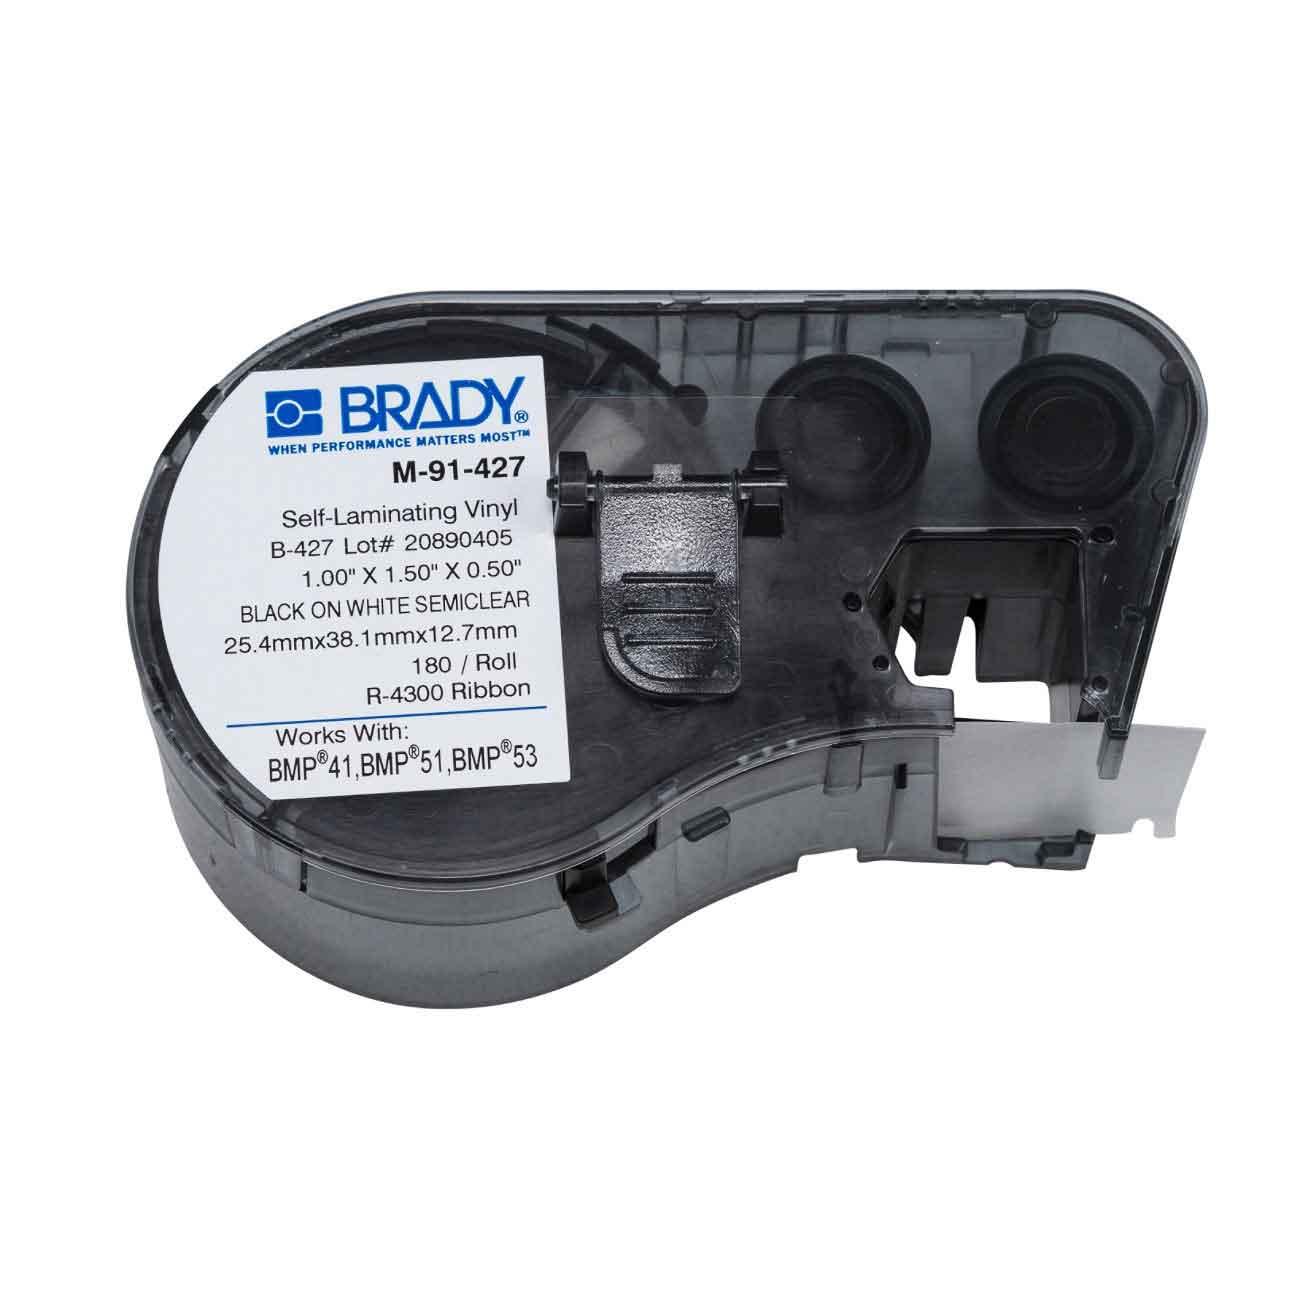 Thermal Transfer Printable Translucent Vinyl Tape, 38.1 x 44.45mm, BMP51 (x140)